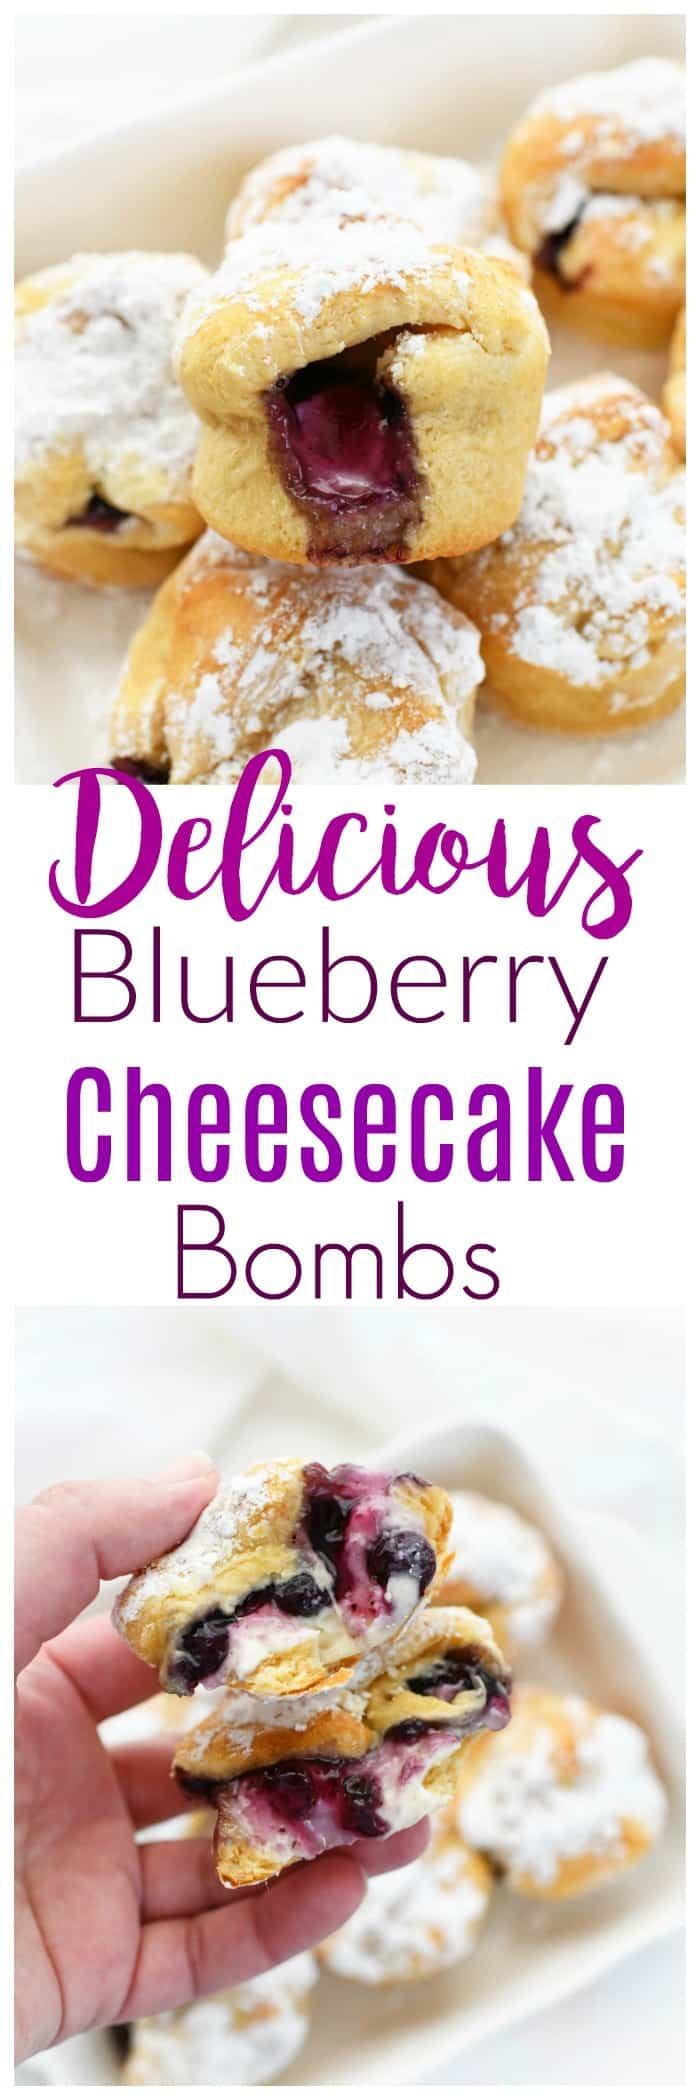 Blueberry Cheesecake Bombs